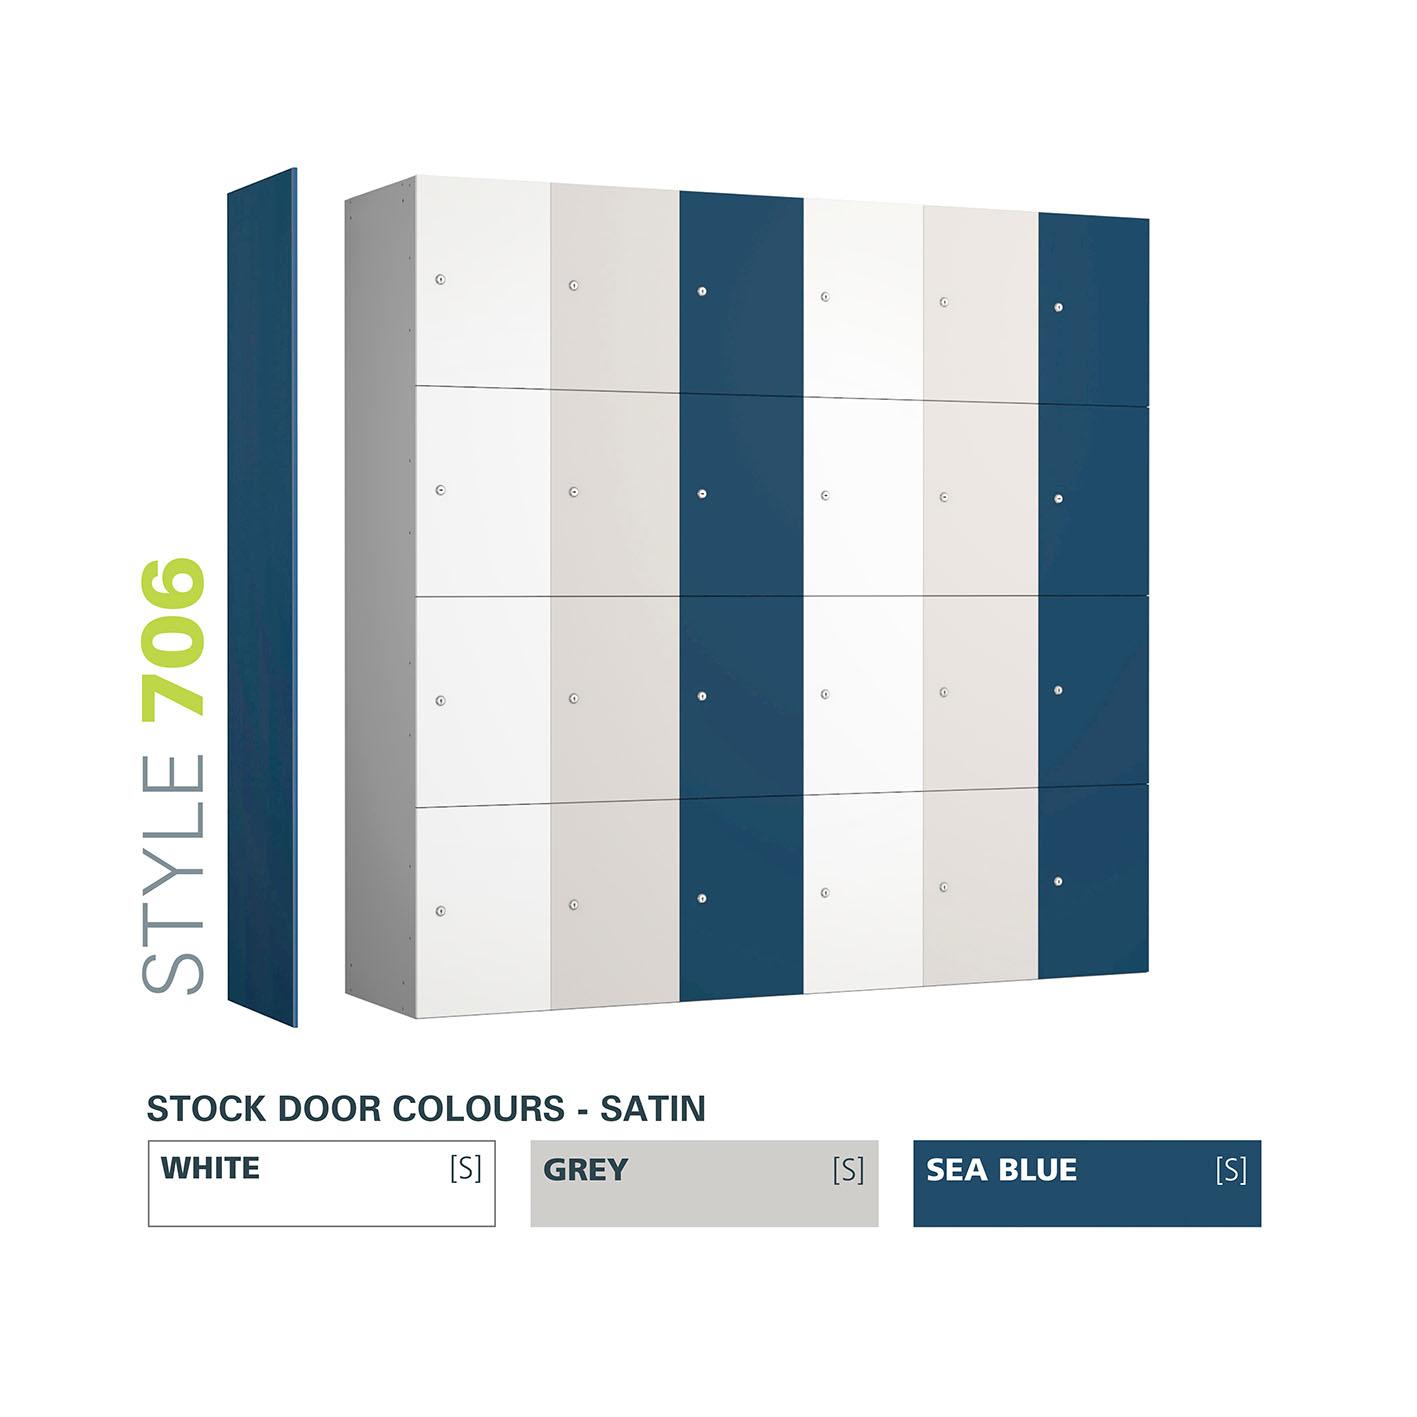 Probe buzzbox colours style 706